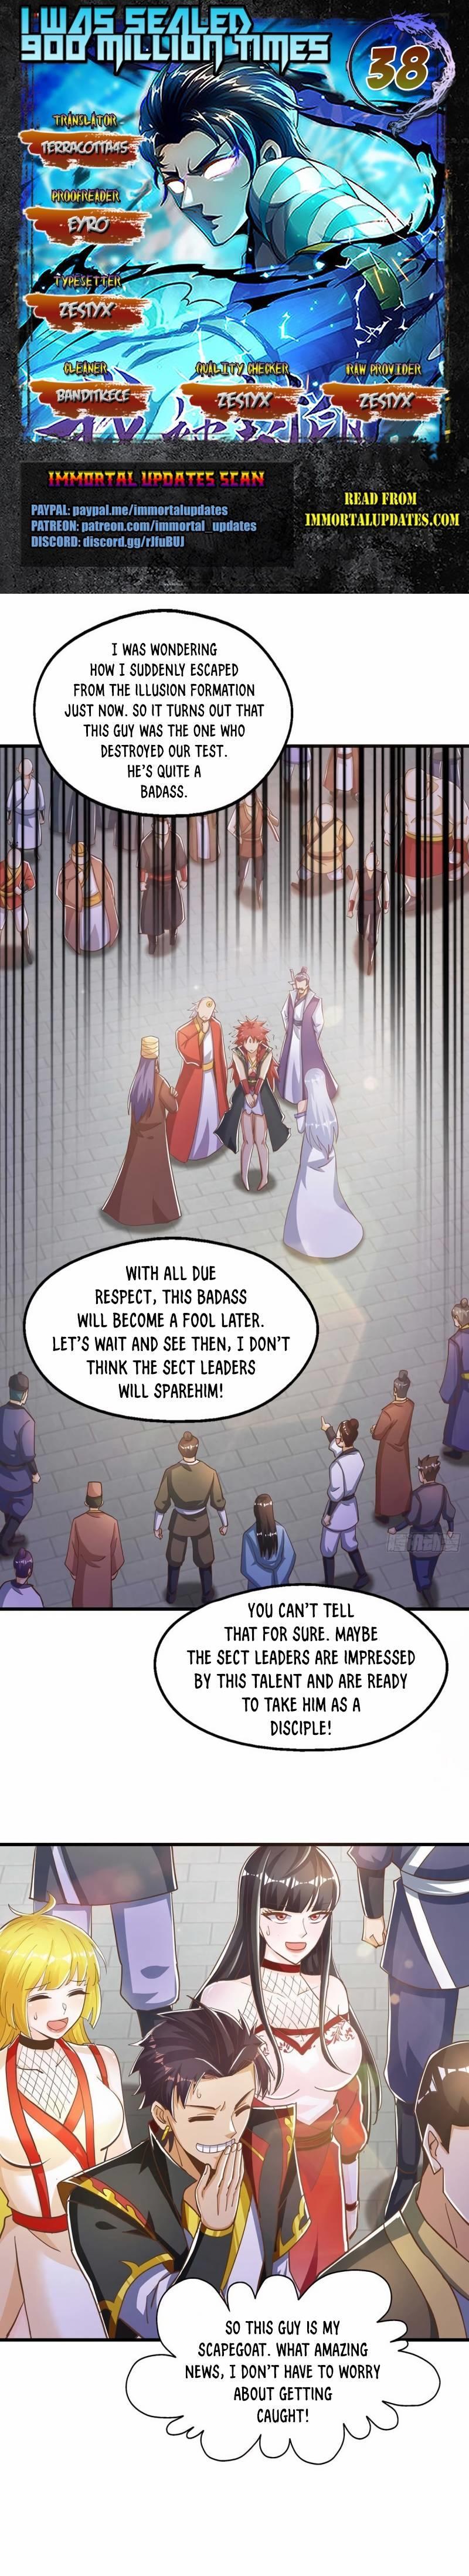 I Was Sealed 900 Million Times Chapter 38 page 1 - Mangakakalots.com